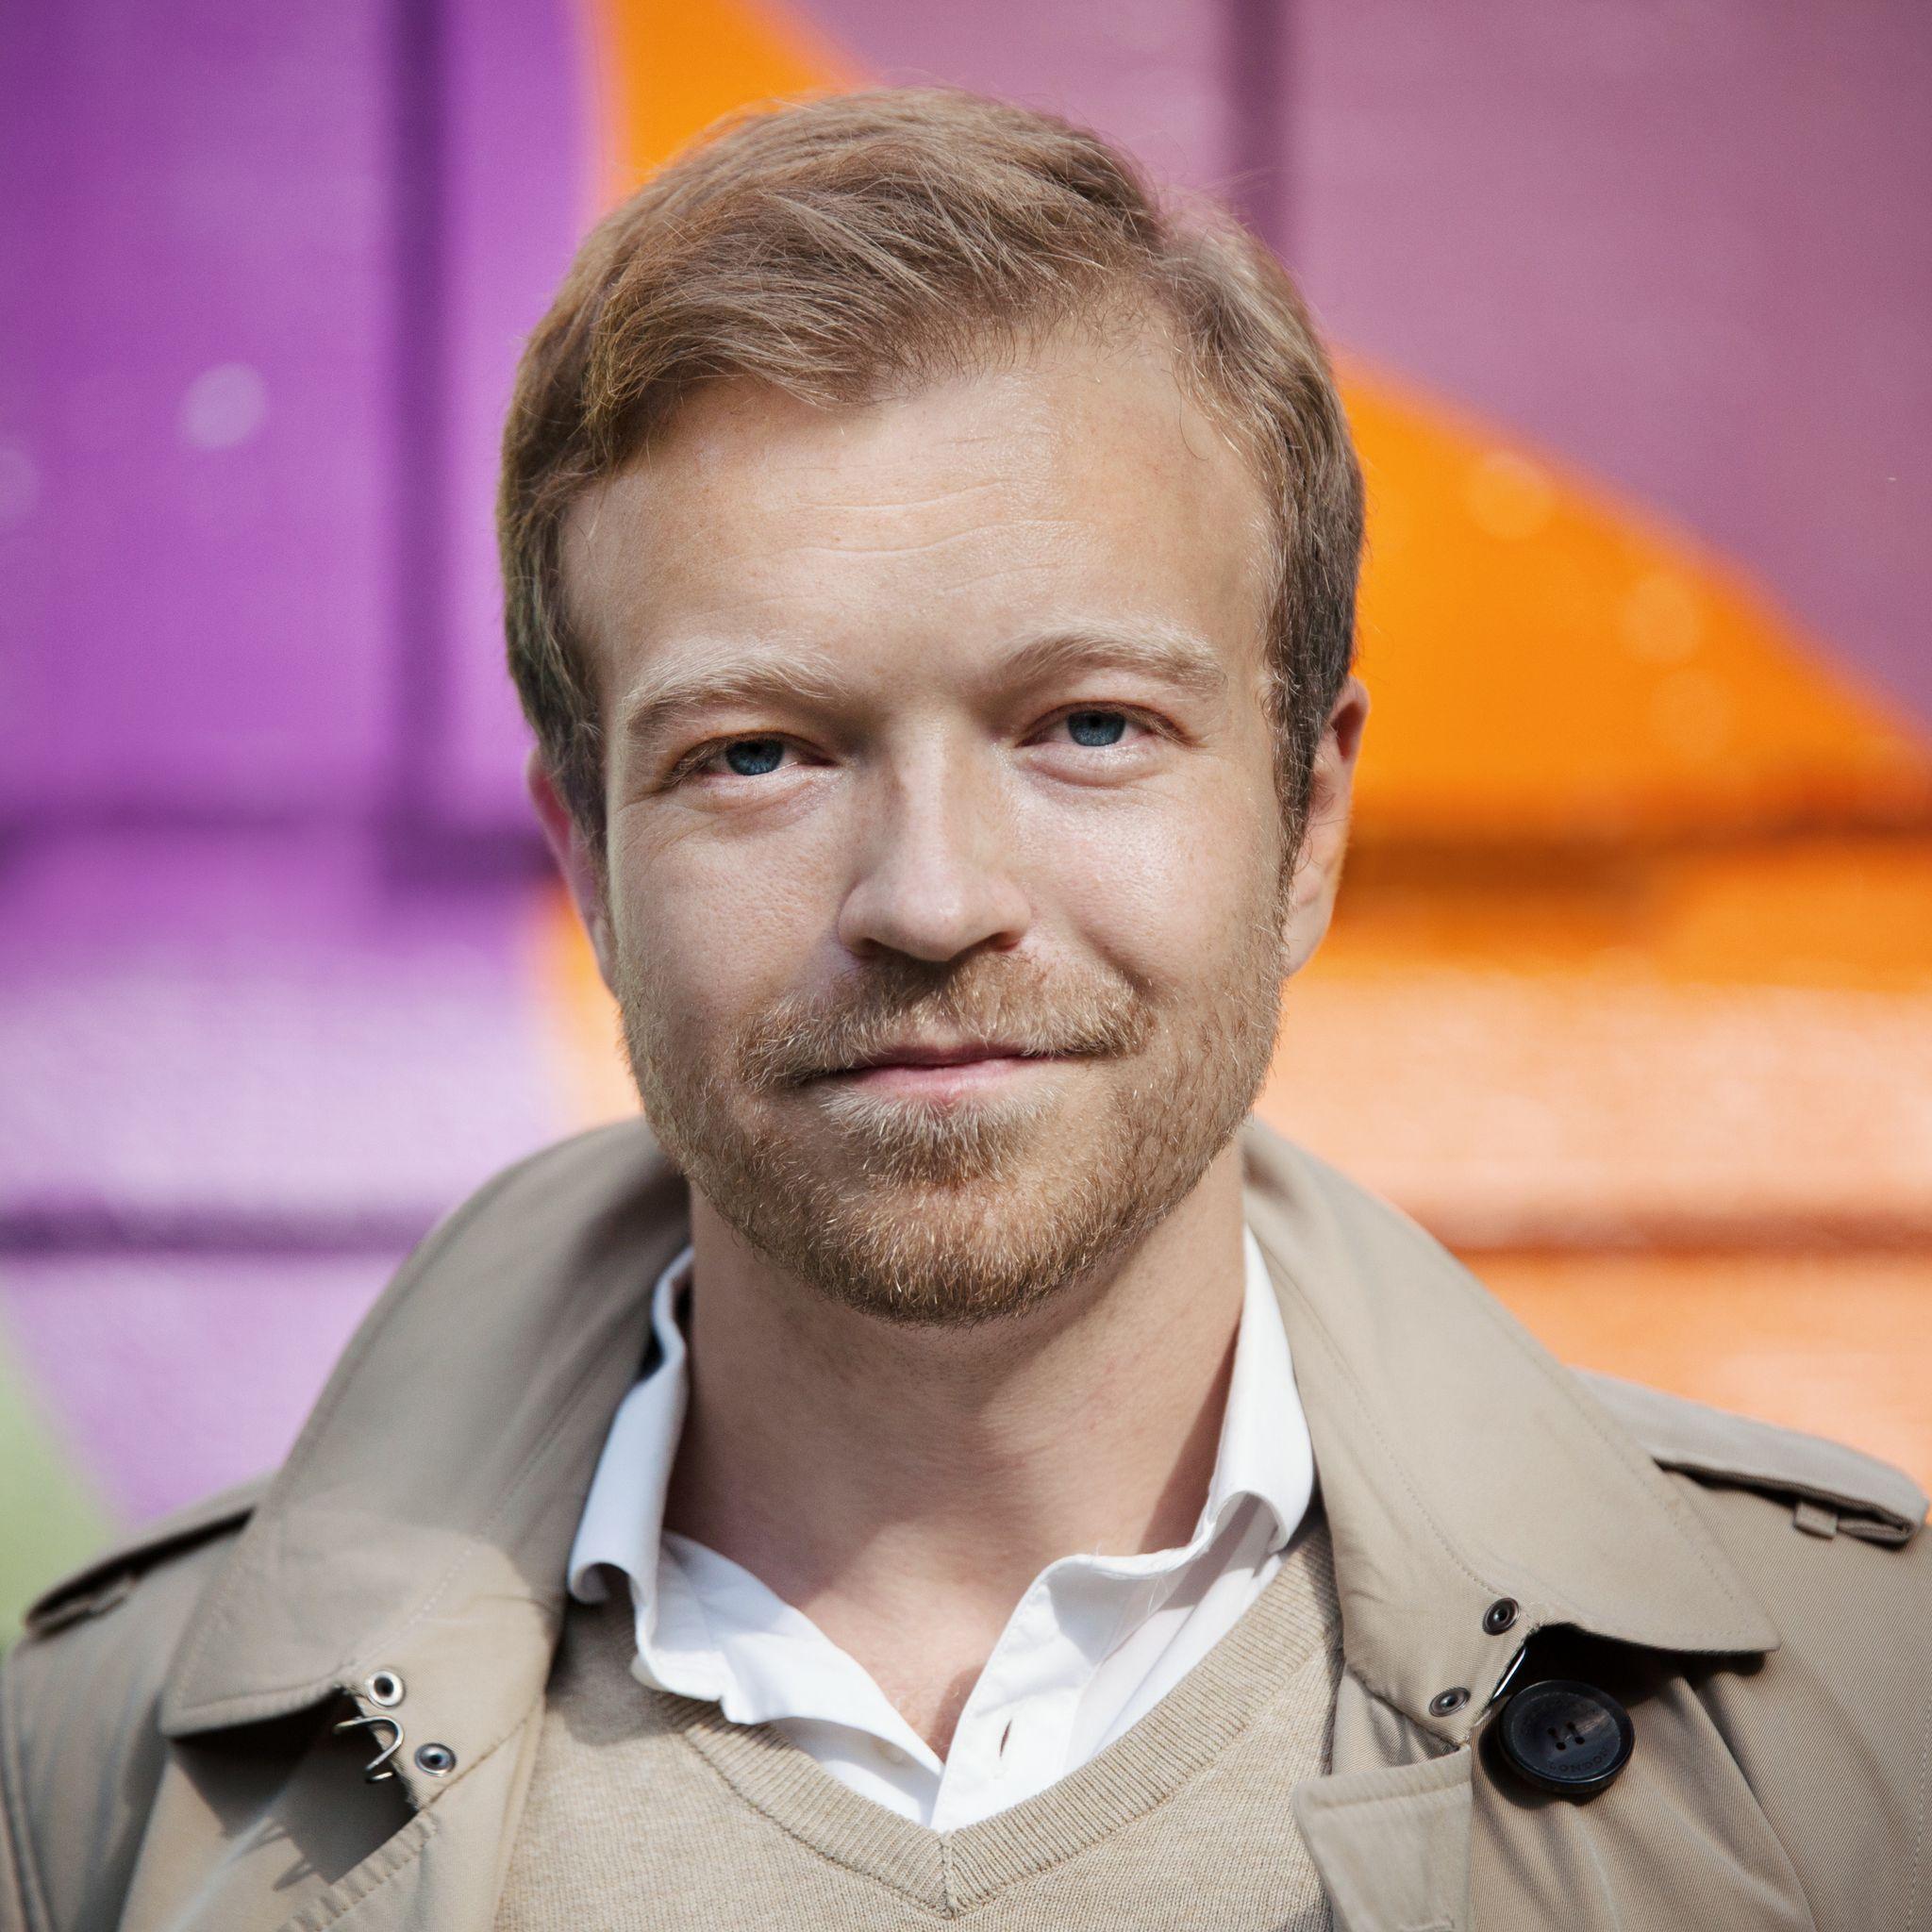 Lars Halse Kneppe